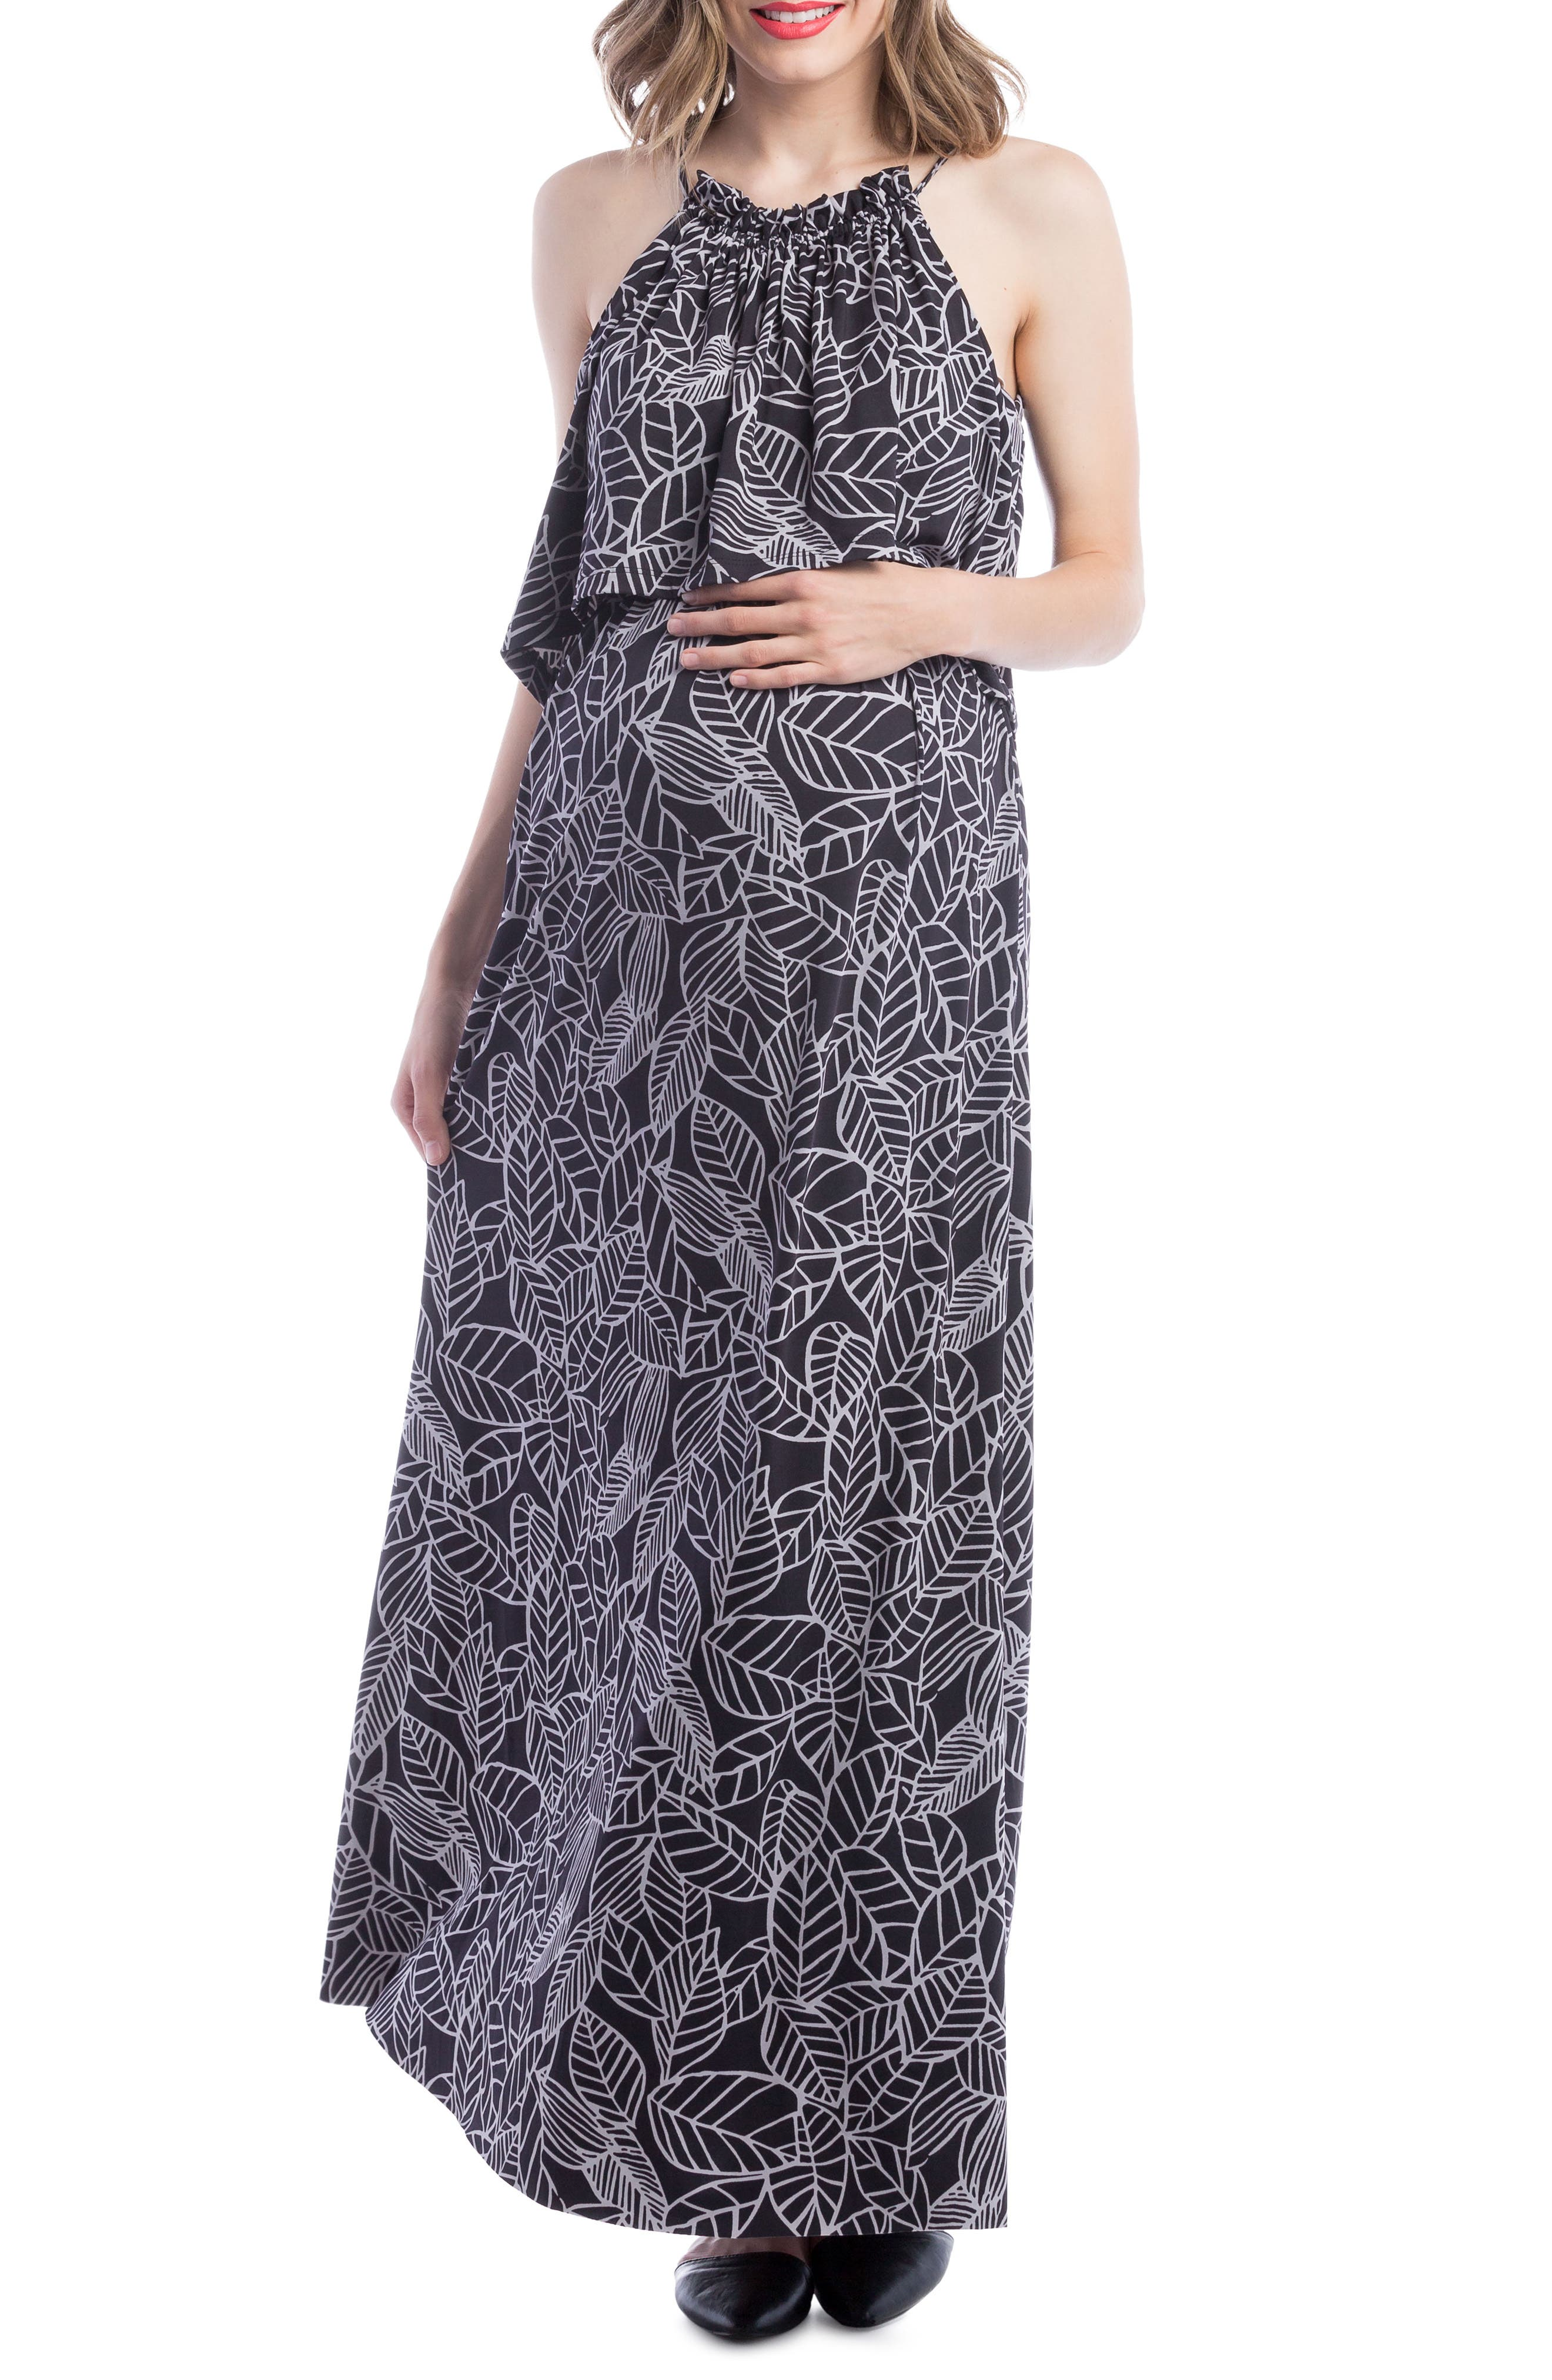 Alternate Image 1 Selected - Lilac Clothing Maternity/Nursing Maxi Dress